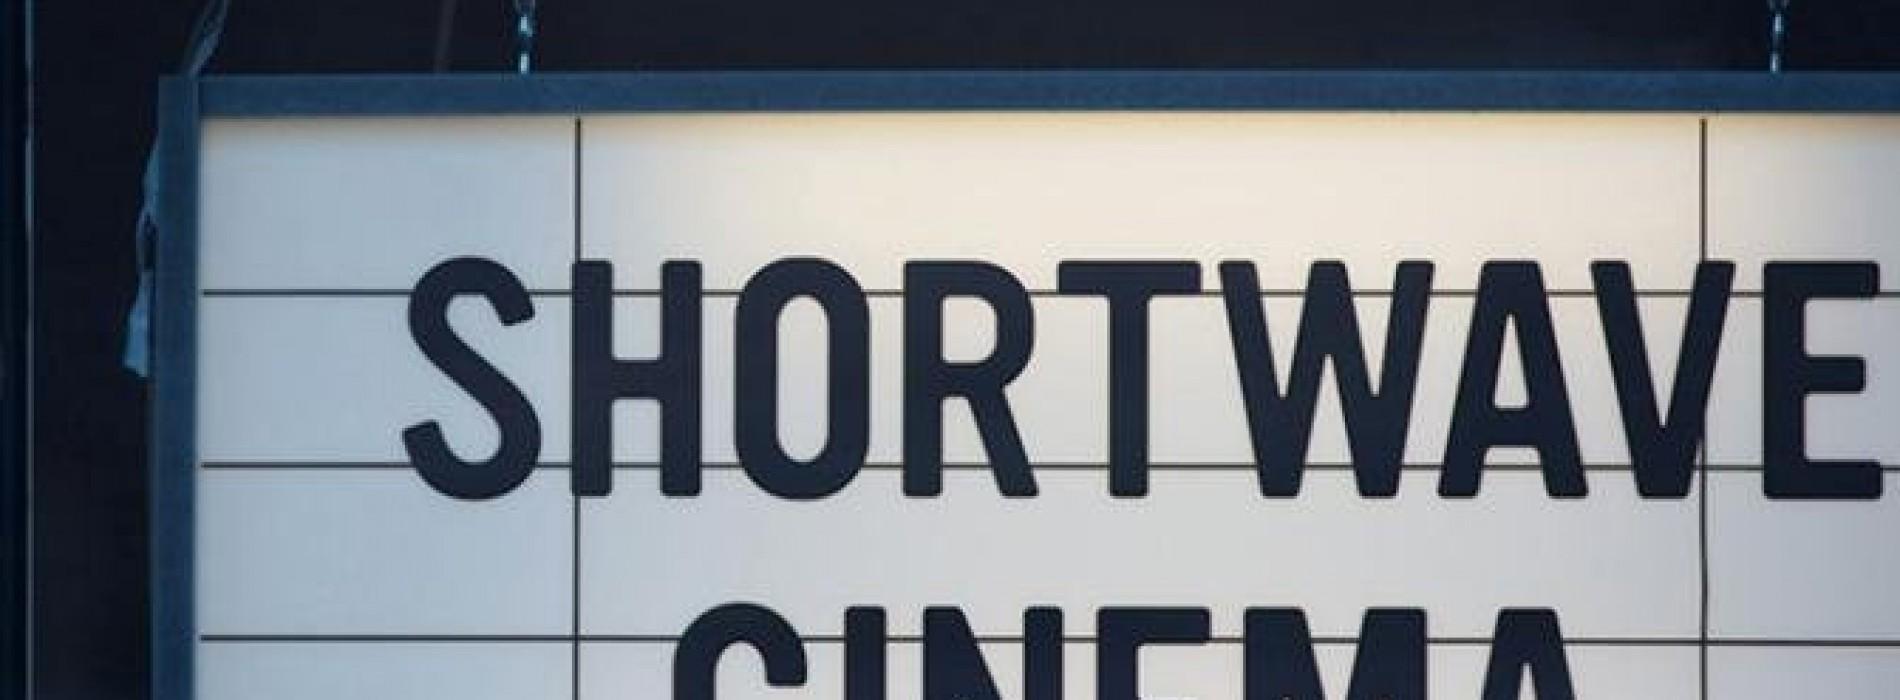 Shortwave Cinema: Bridge Of Spies